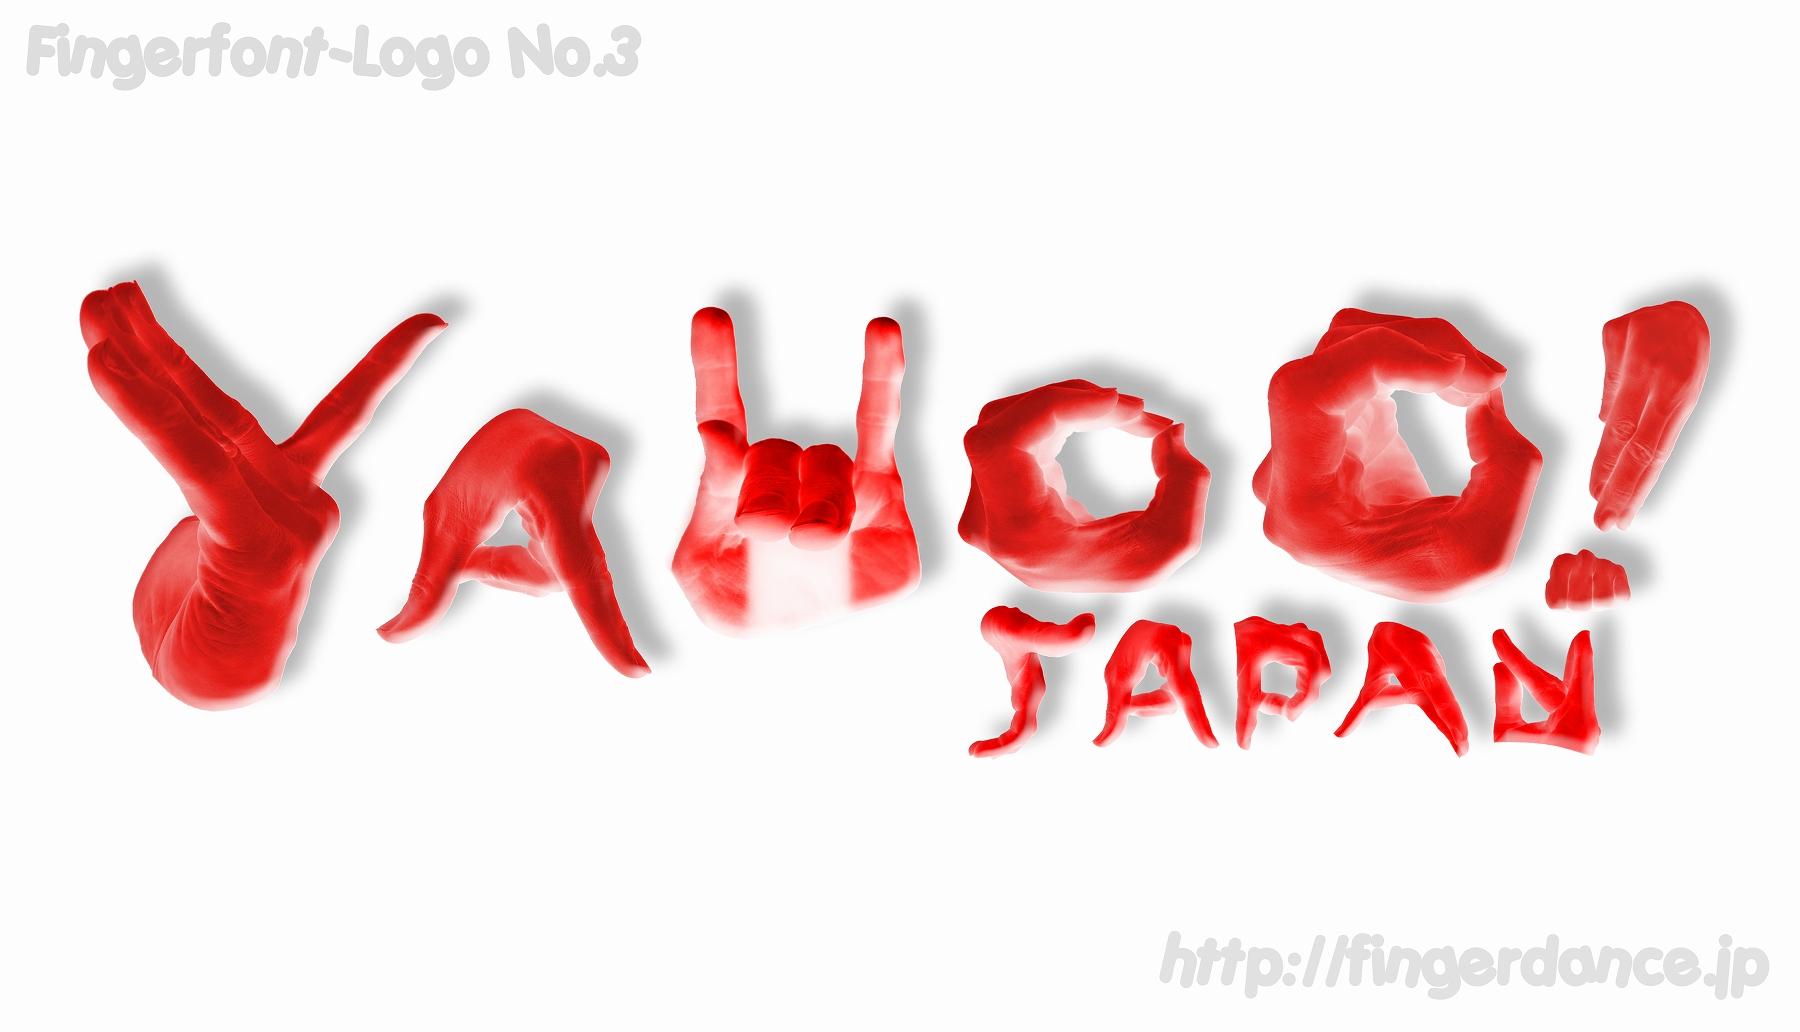 Yahoo-fingerlogohand ヤフー・フィンガーロゴハンド手指字